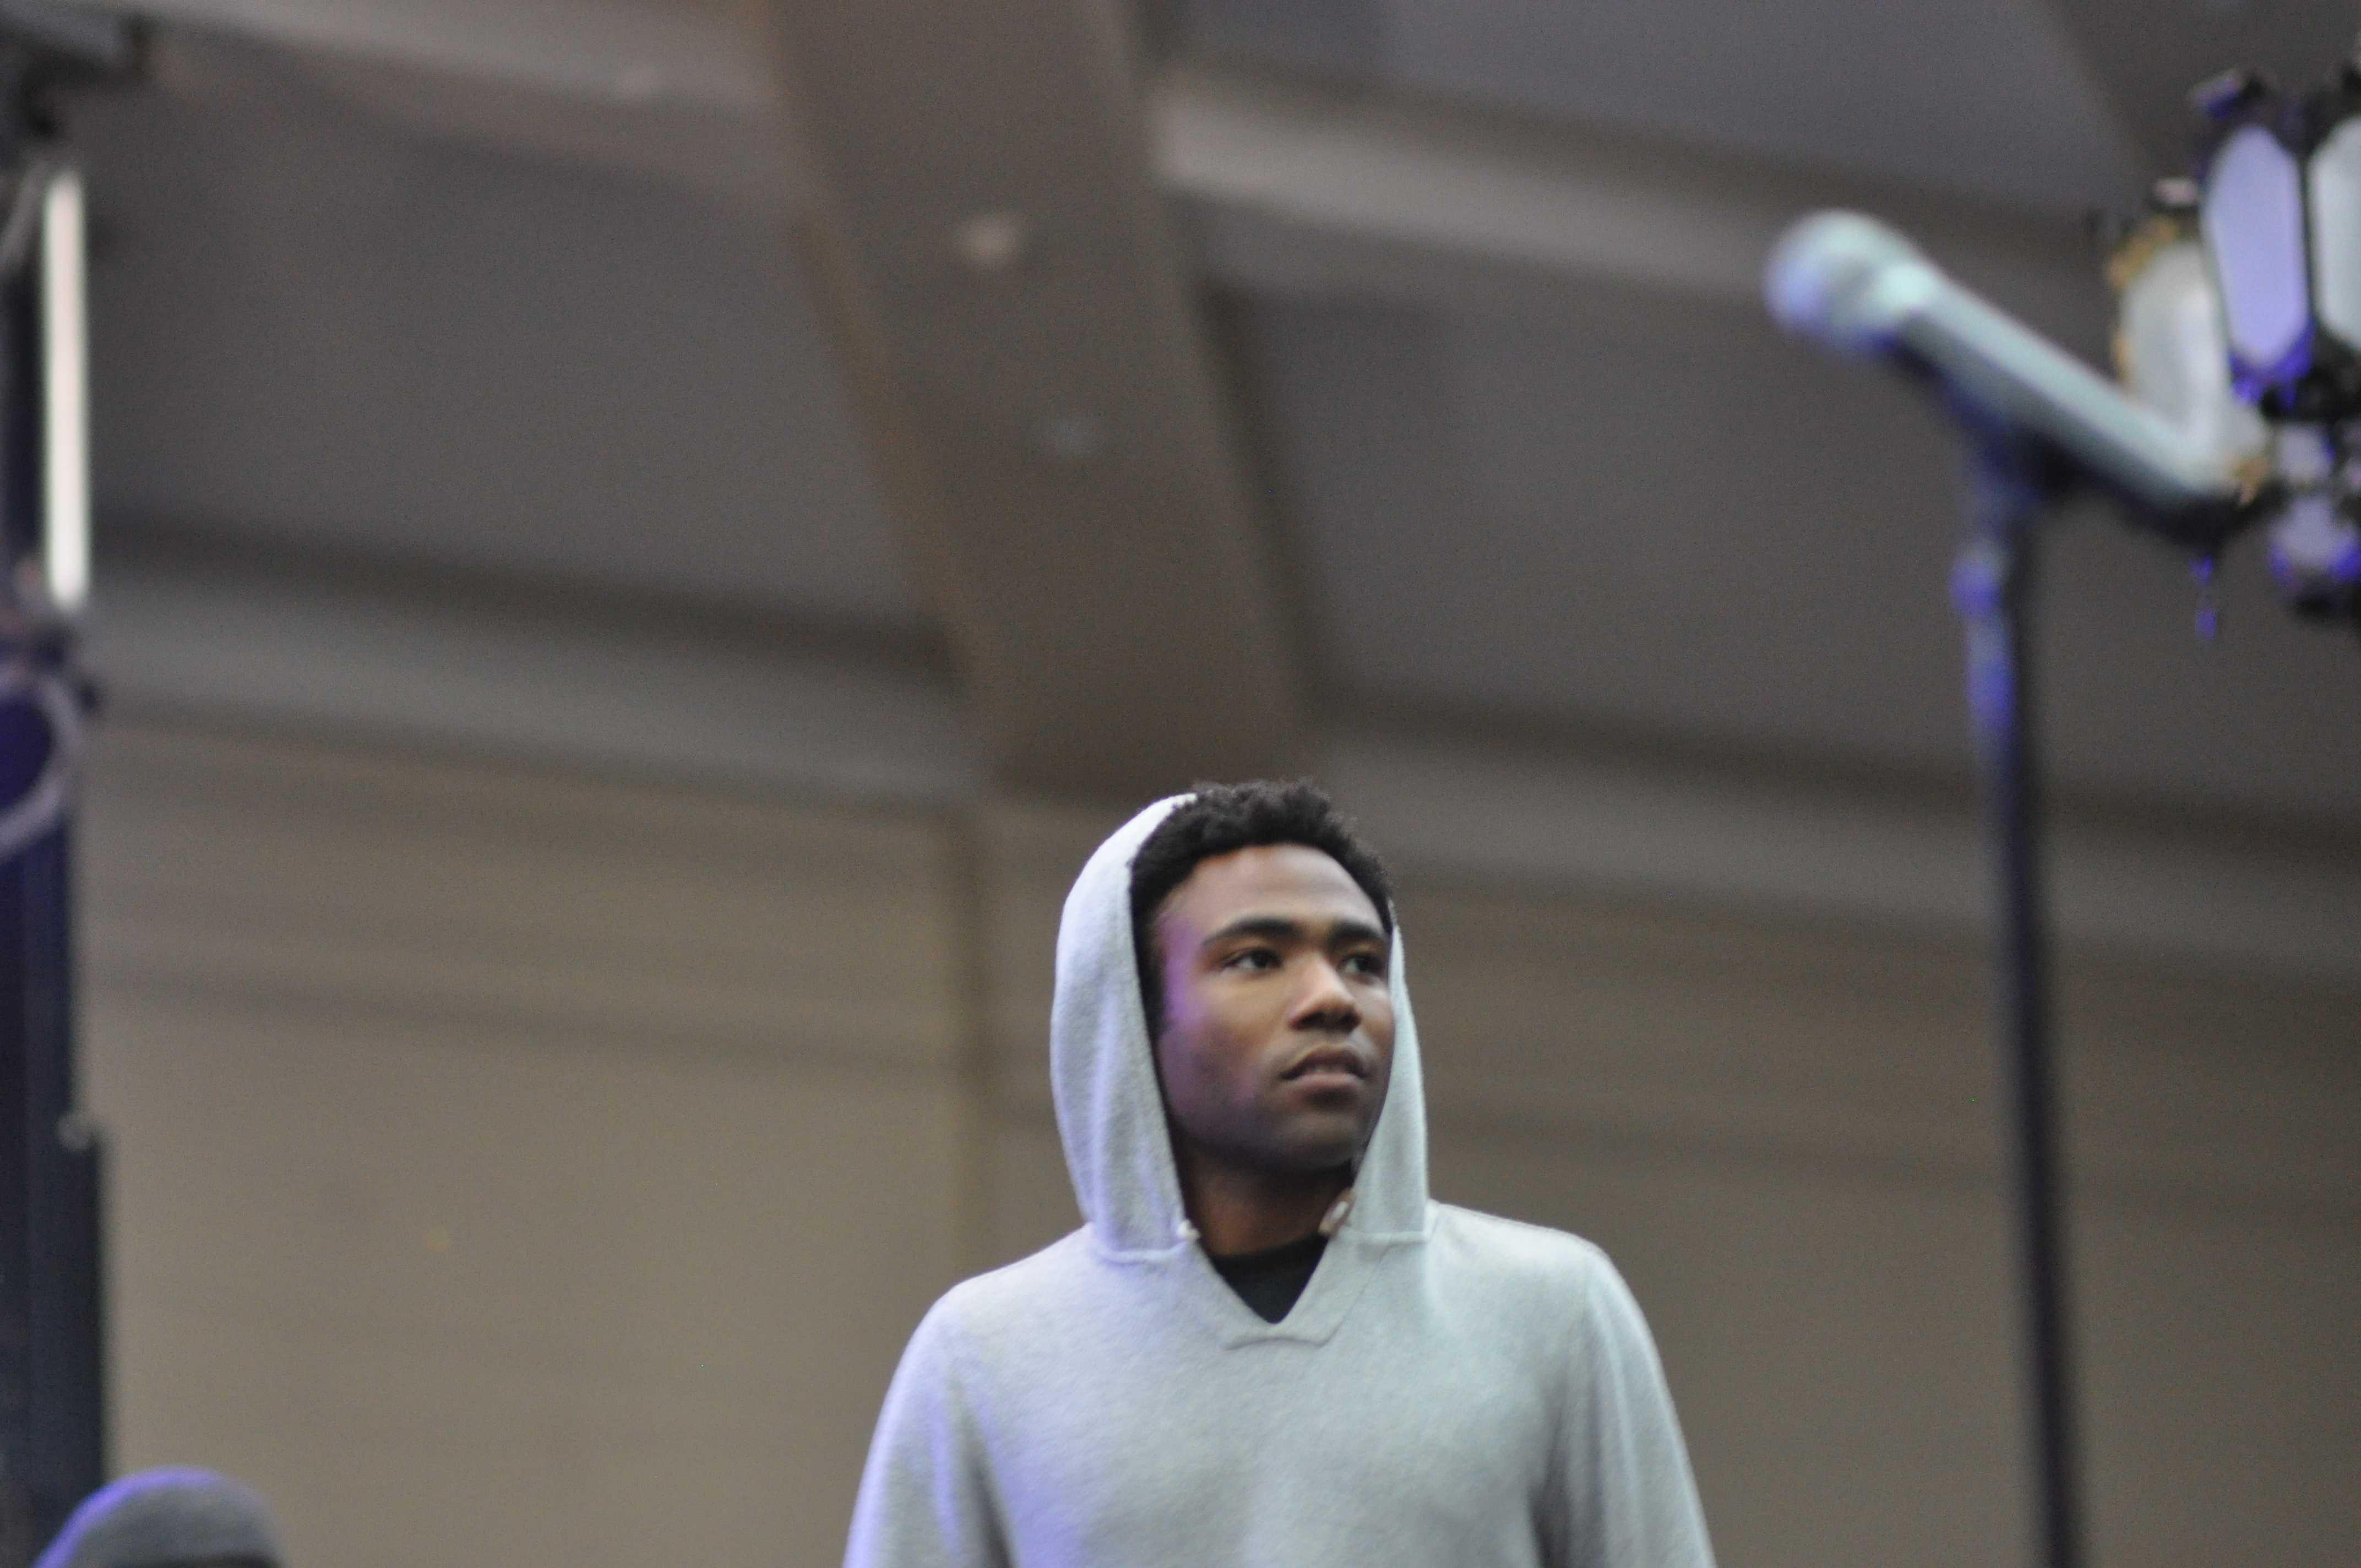 Donald Glover AKA Childish Gambino slowly walking on stage.